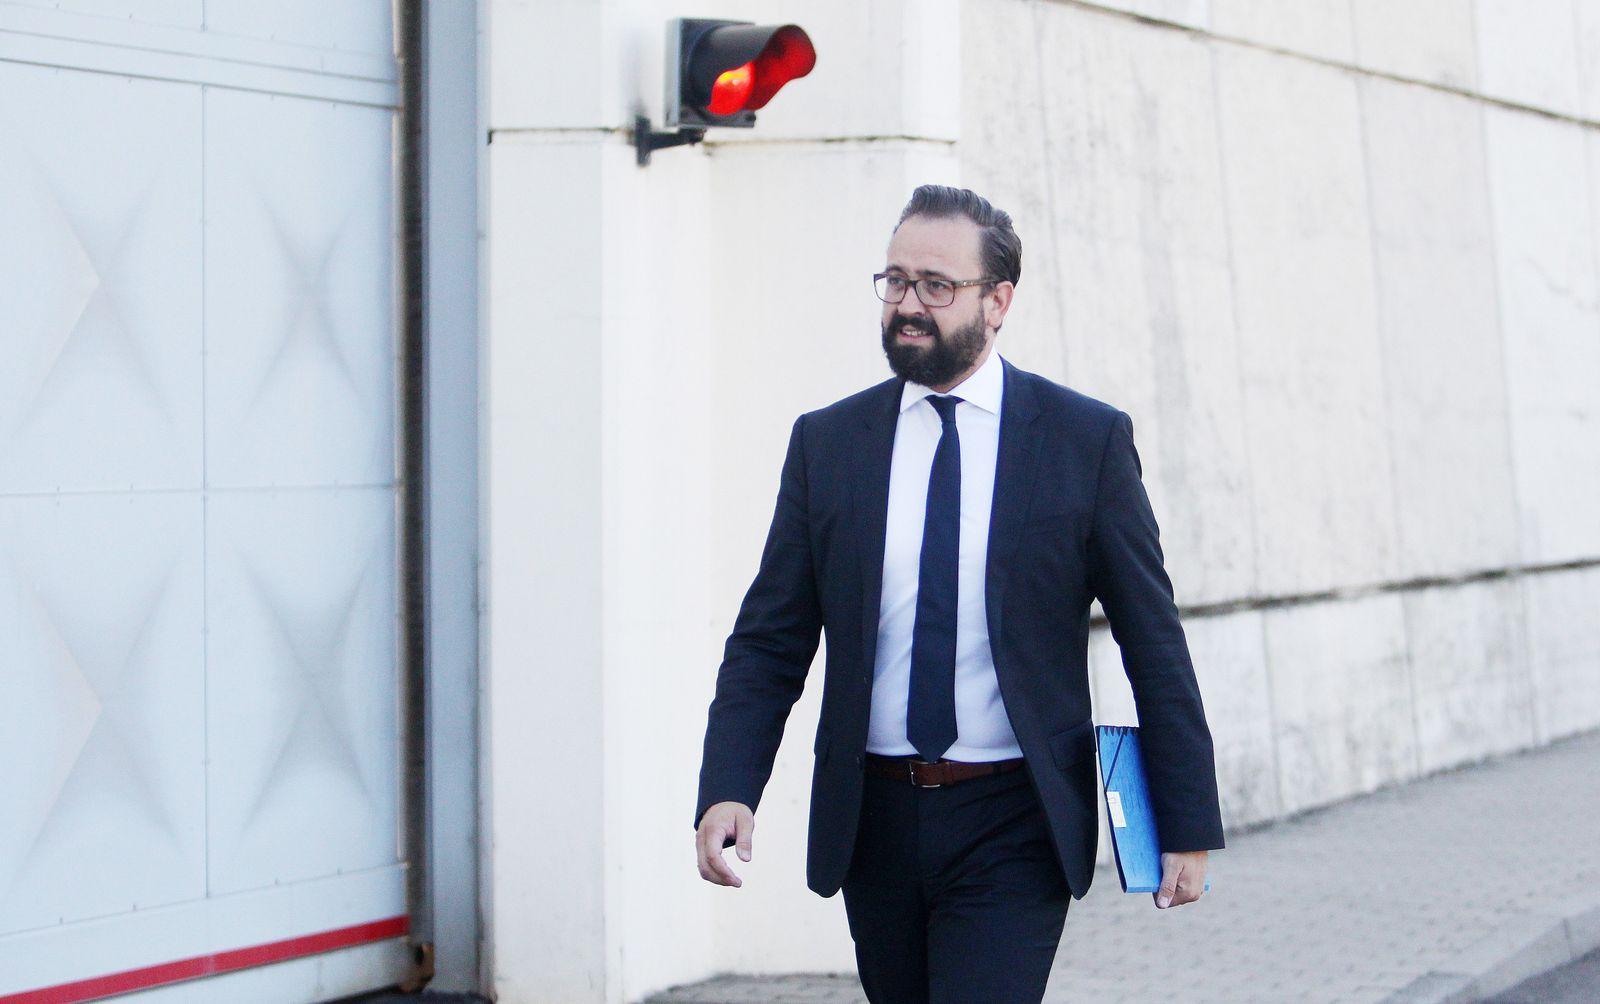 Sachsen/ Justizminister/ Sebastian Gemkow besucht JVA Leipzig